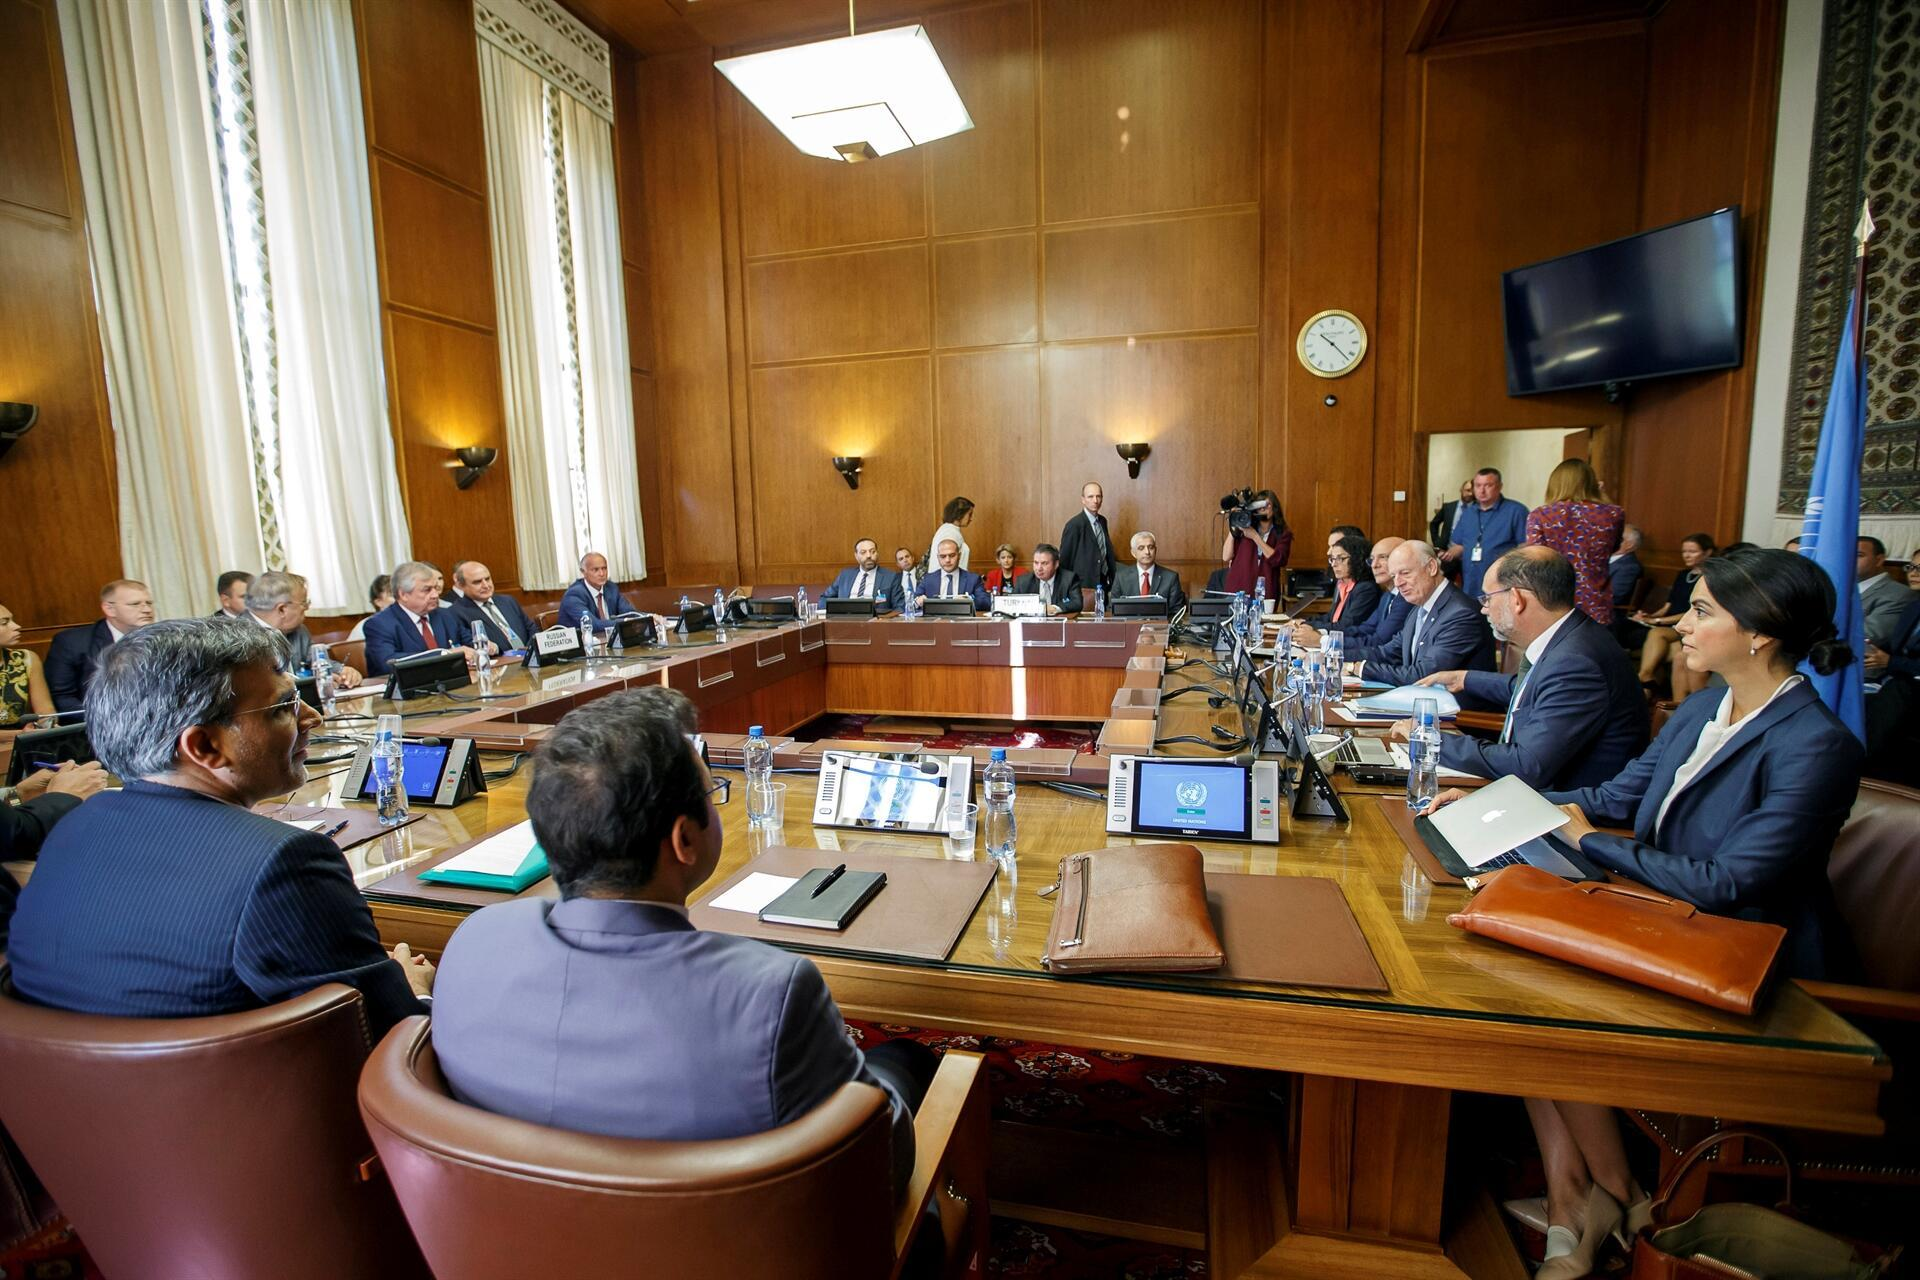 Turkey Russia Iran Reach Agreement In Principle On Syria